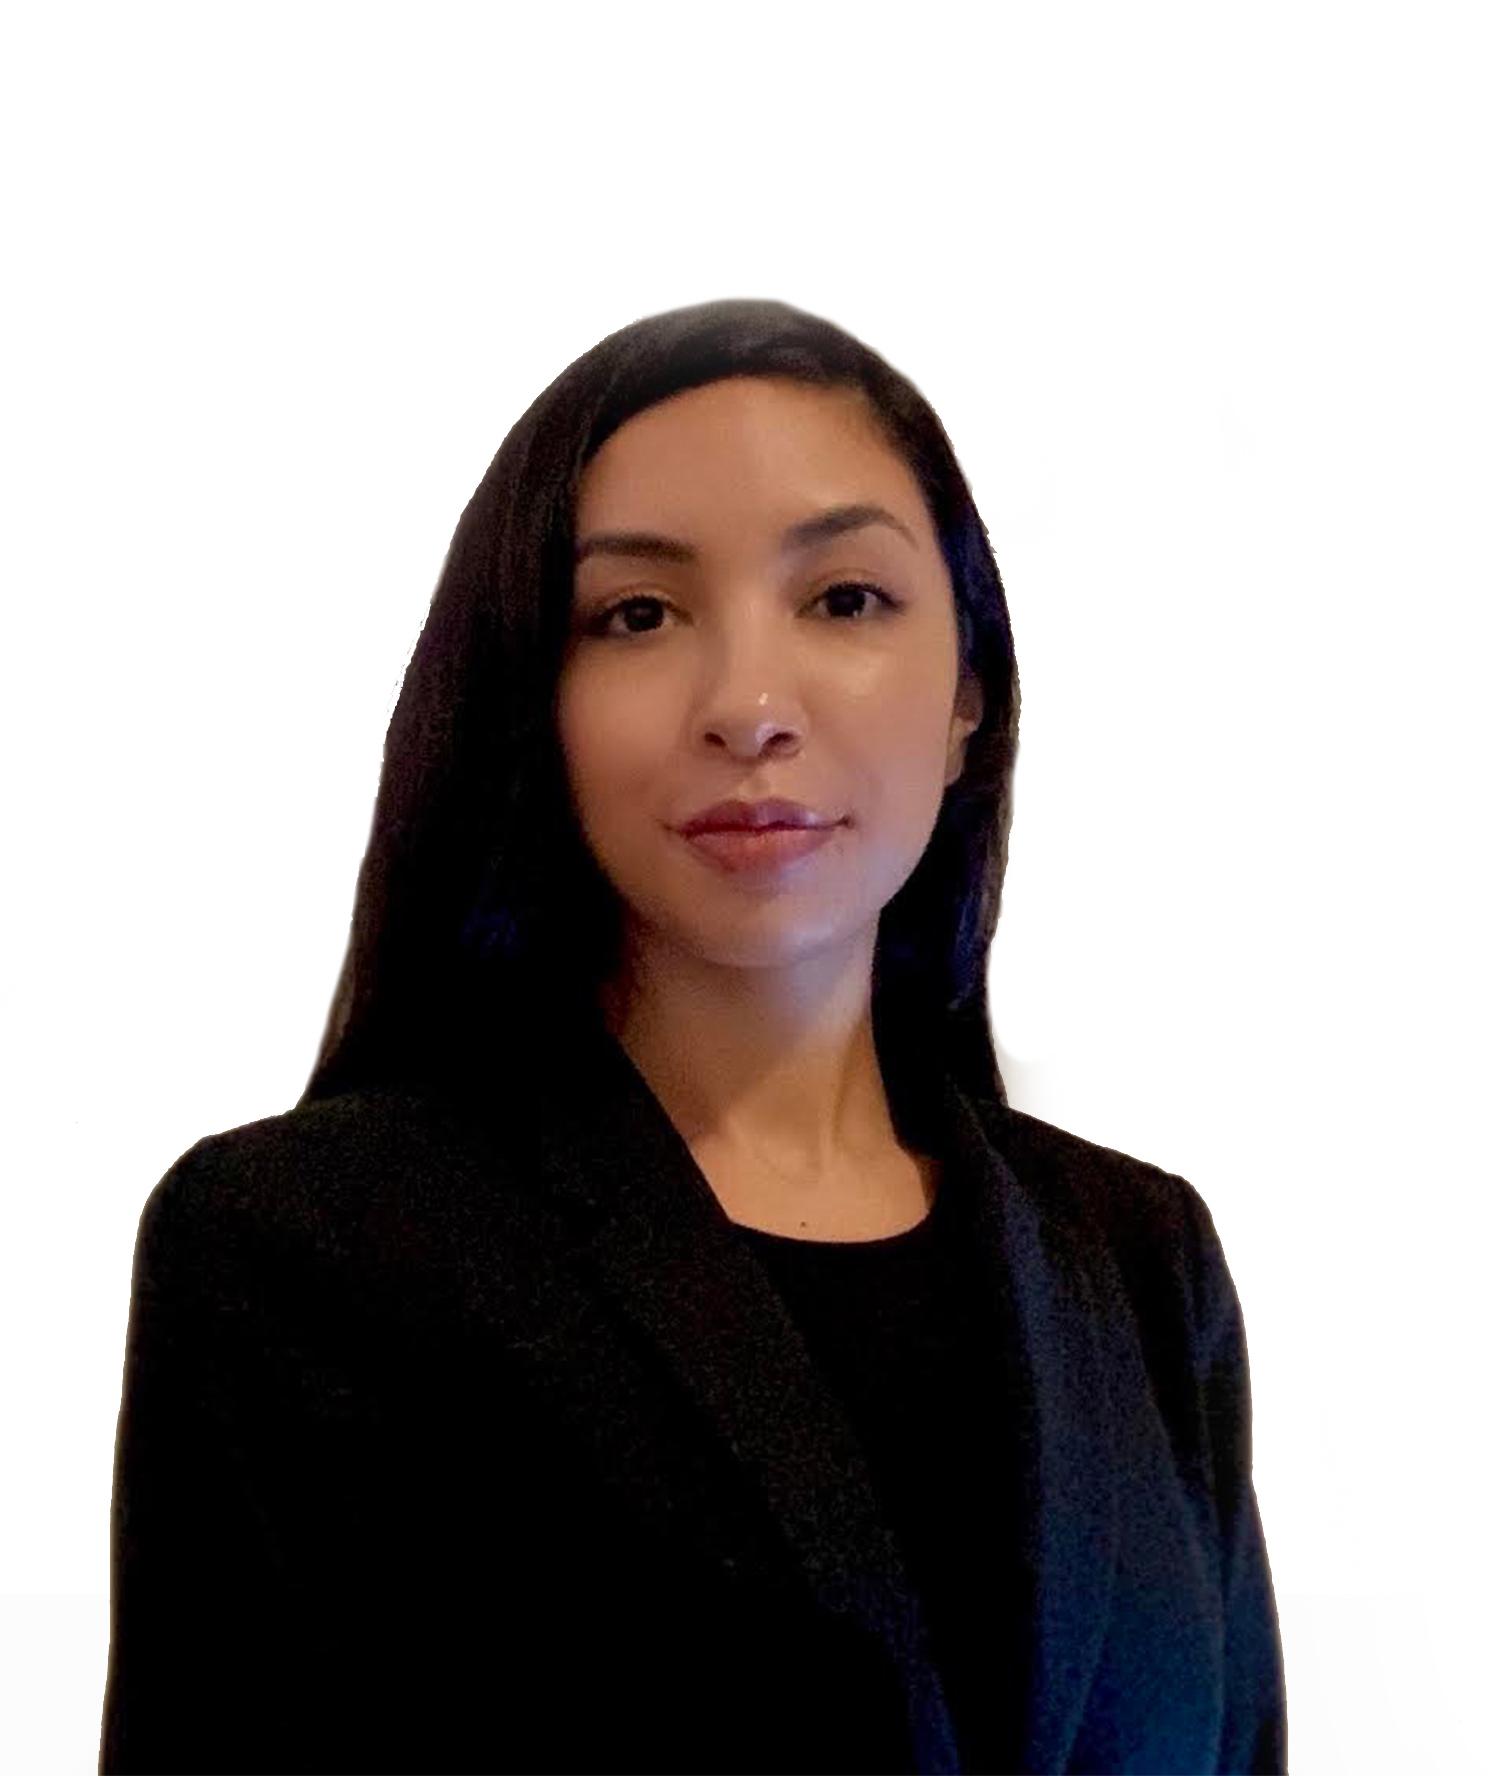 Natalie Rodriguez